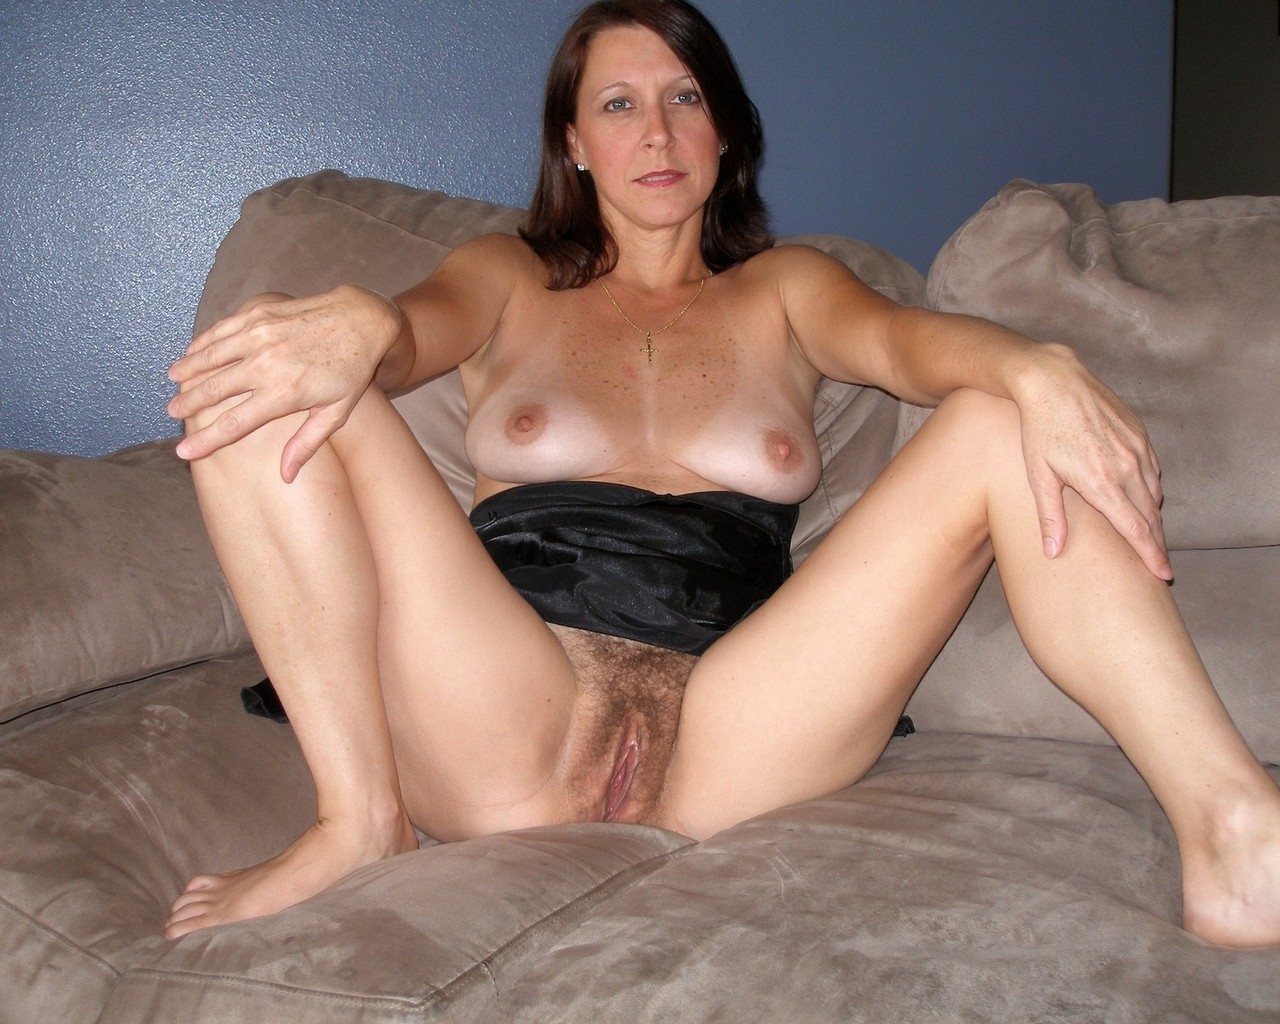 Тетя без трусов порно 13 фотография